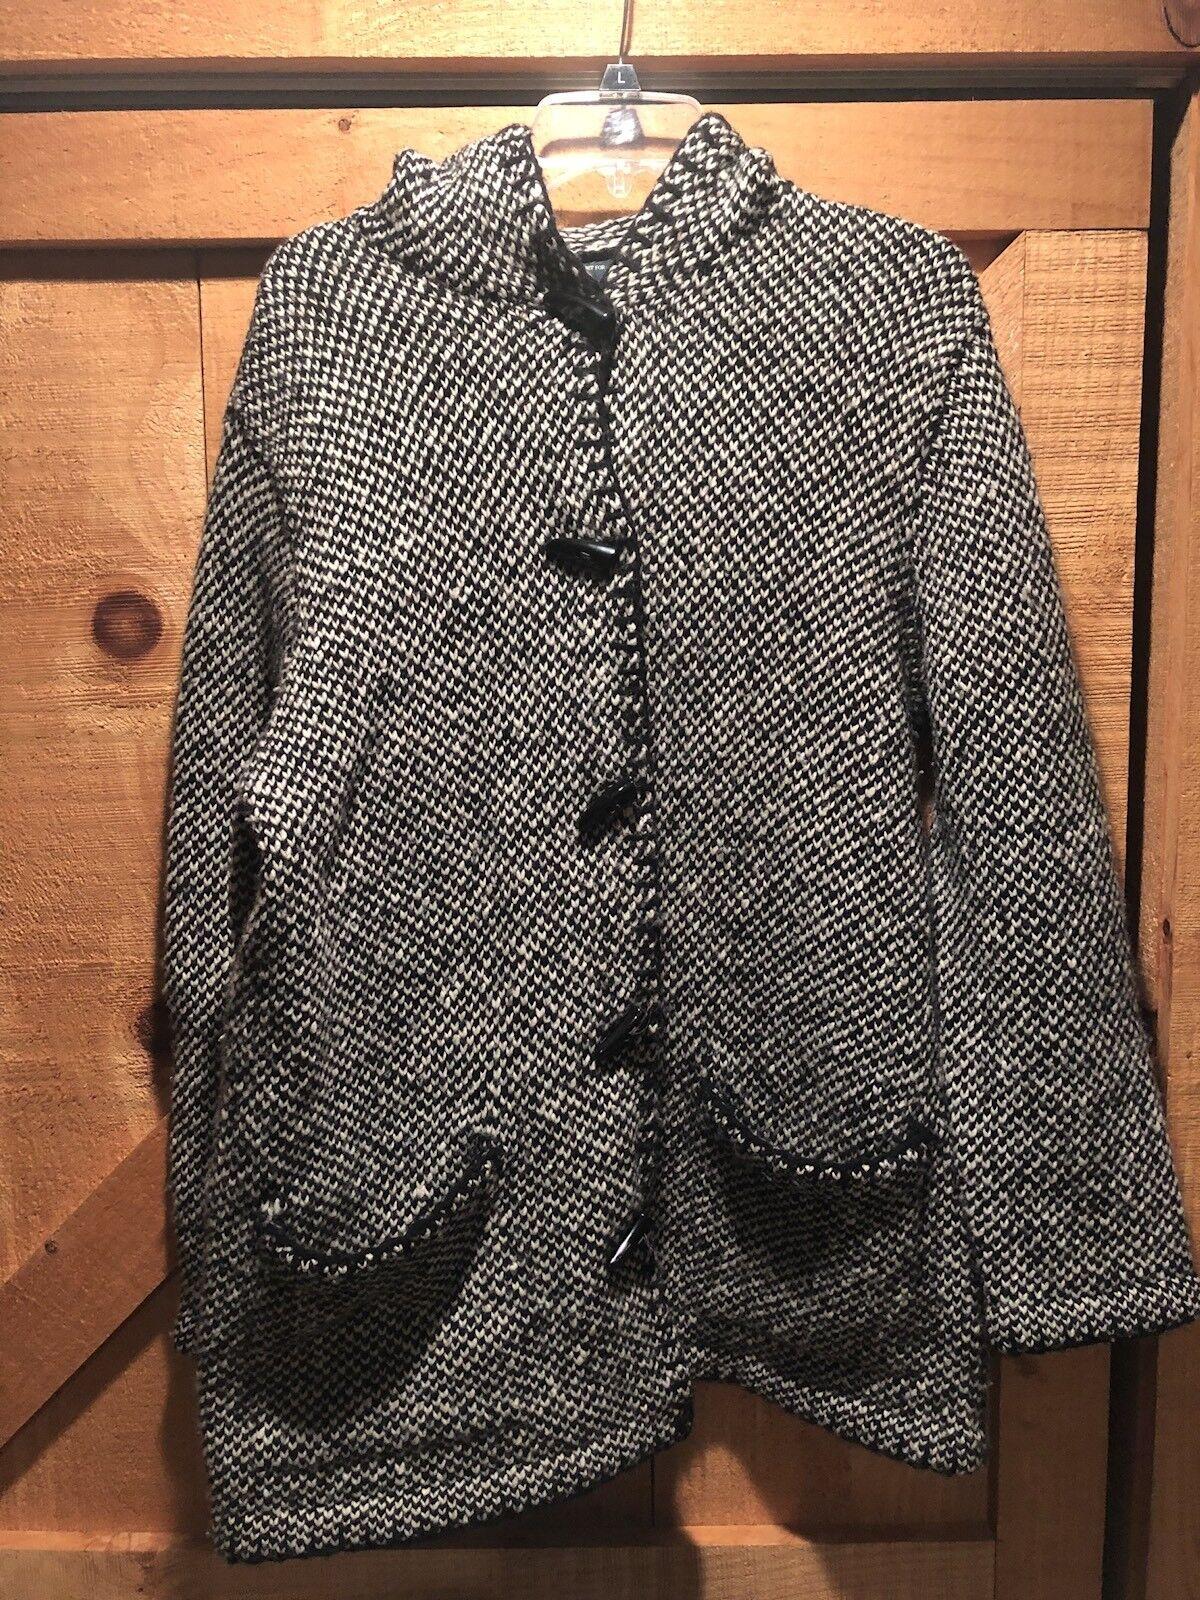 daMänner's Lauren Ralph Lauren Hand Knit Toggle Taste Wolle Sweater Jacket Sz Groß